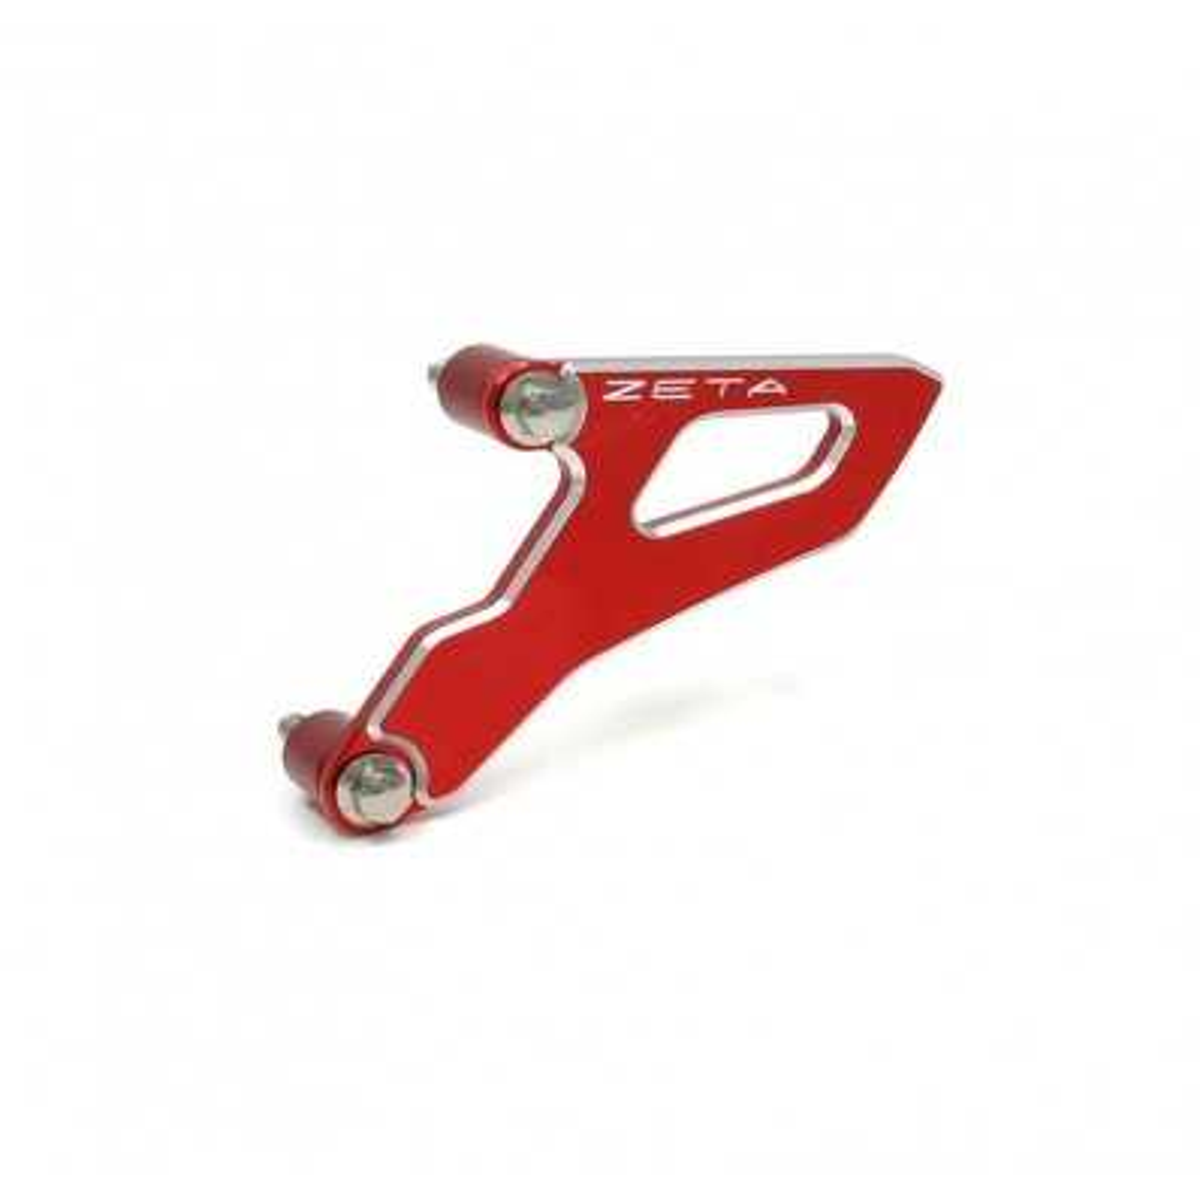 ZE80.9035 - Protector Piñon Salida Zeta Aluminio Suzuki Rmz250 04 06 Rojo